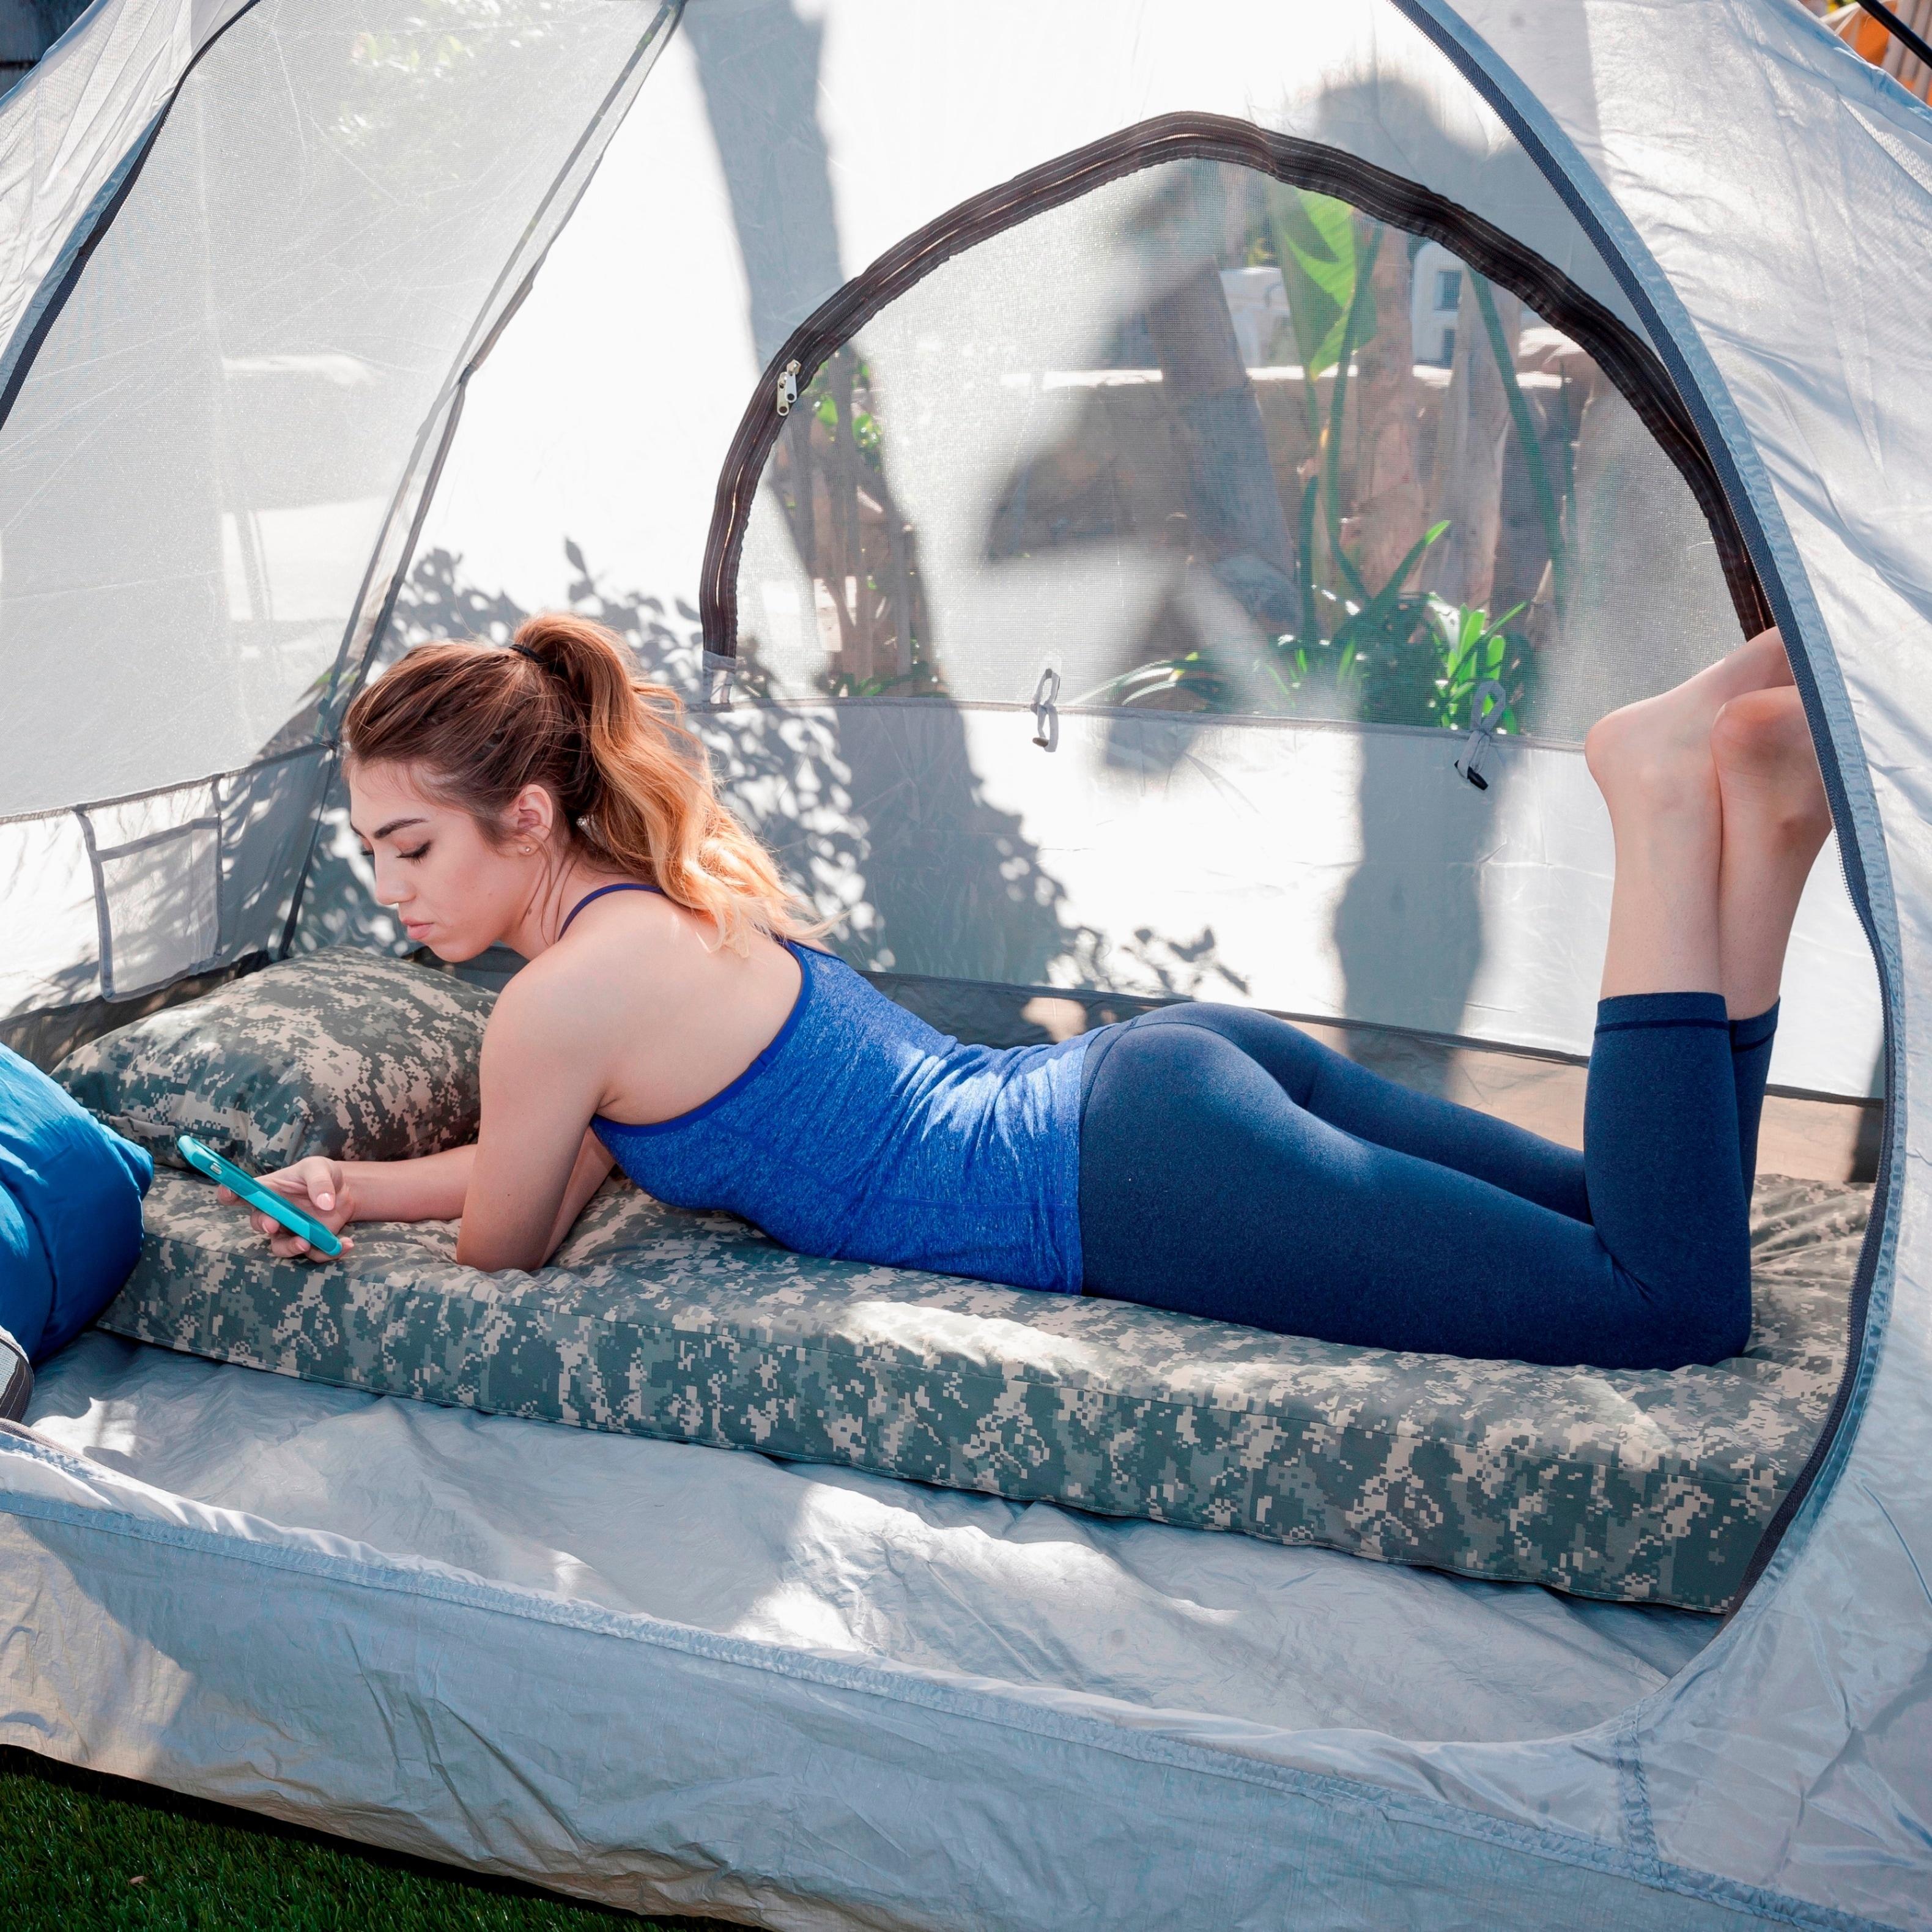 Outdoor Camping Waterproof Tent Foam Orthopedic Camping Sleeping Pad Hiking Tent